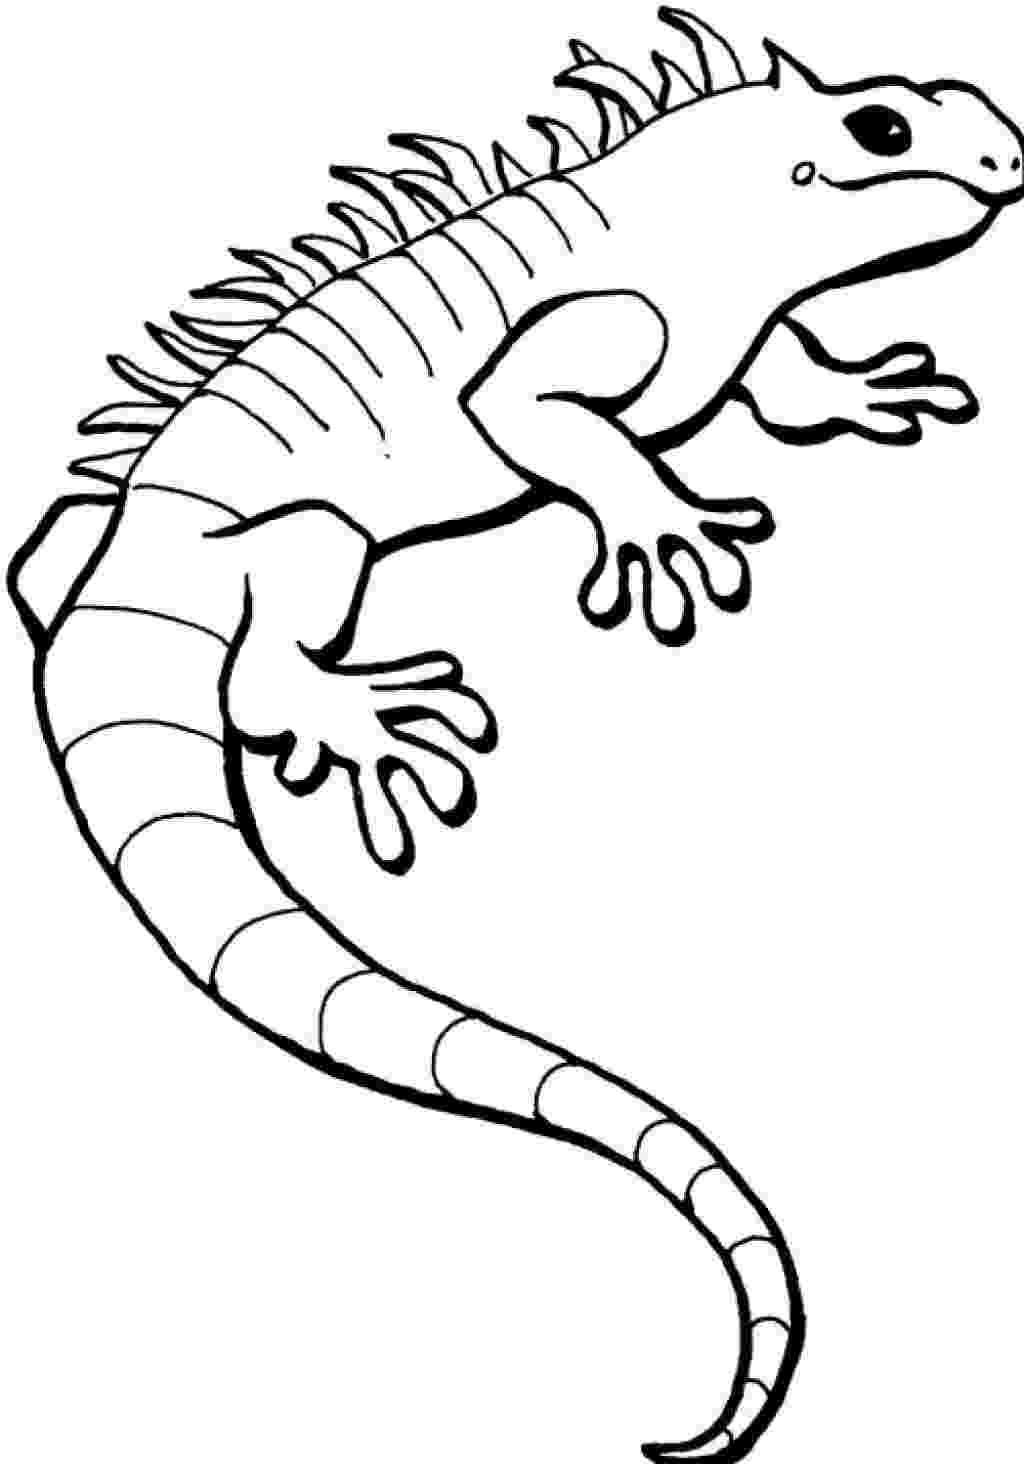 iguana coloring page free printable iguana coloring pages for kids page iguana coloring